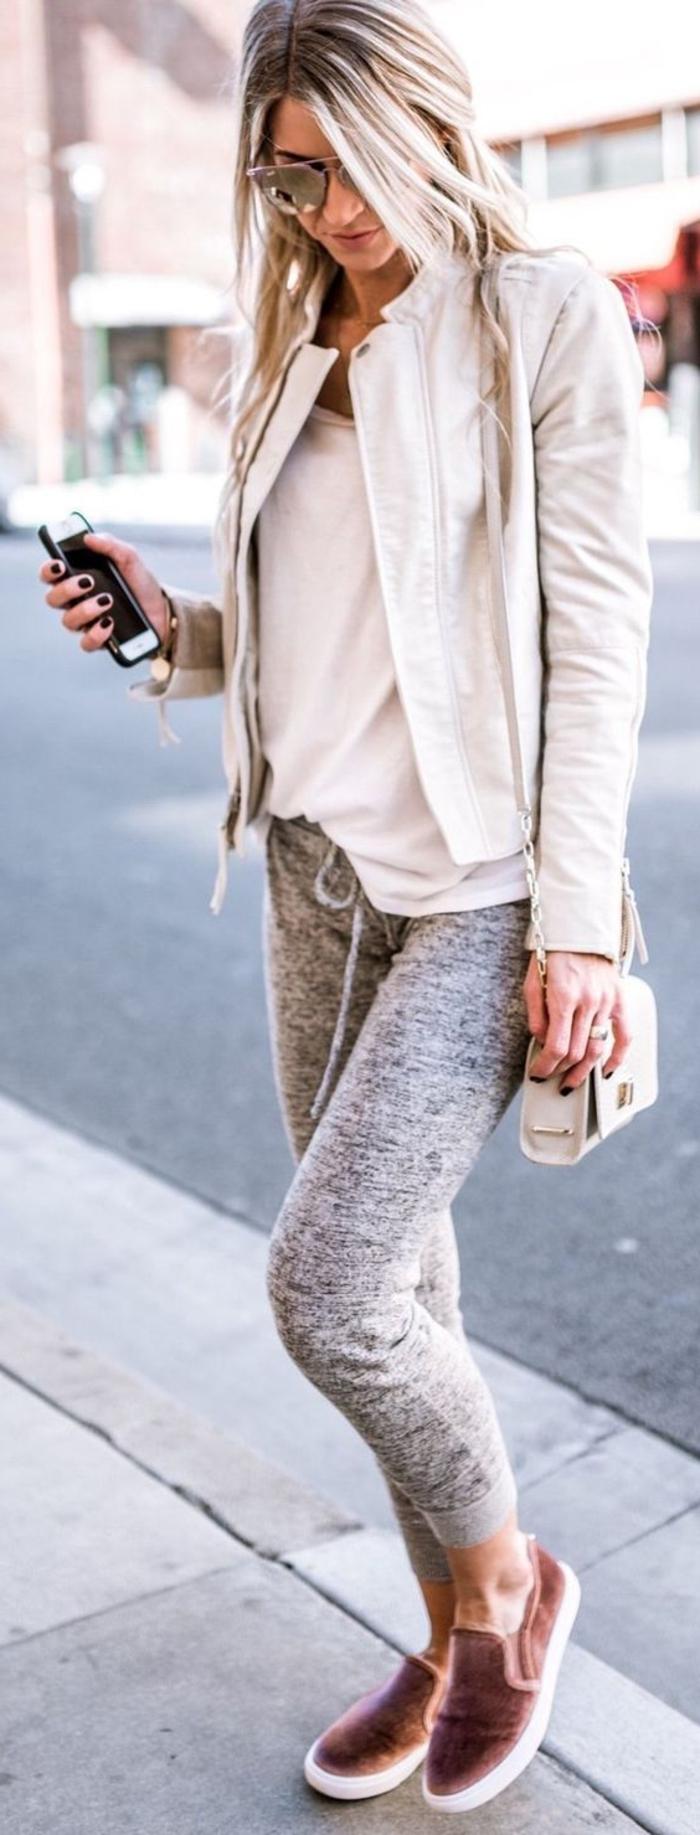 Jogginghose kombinieren elegante tasche kurze jacke und turnschuhe